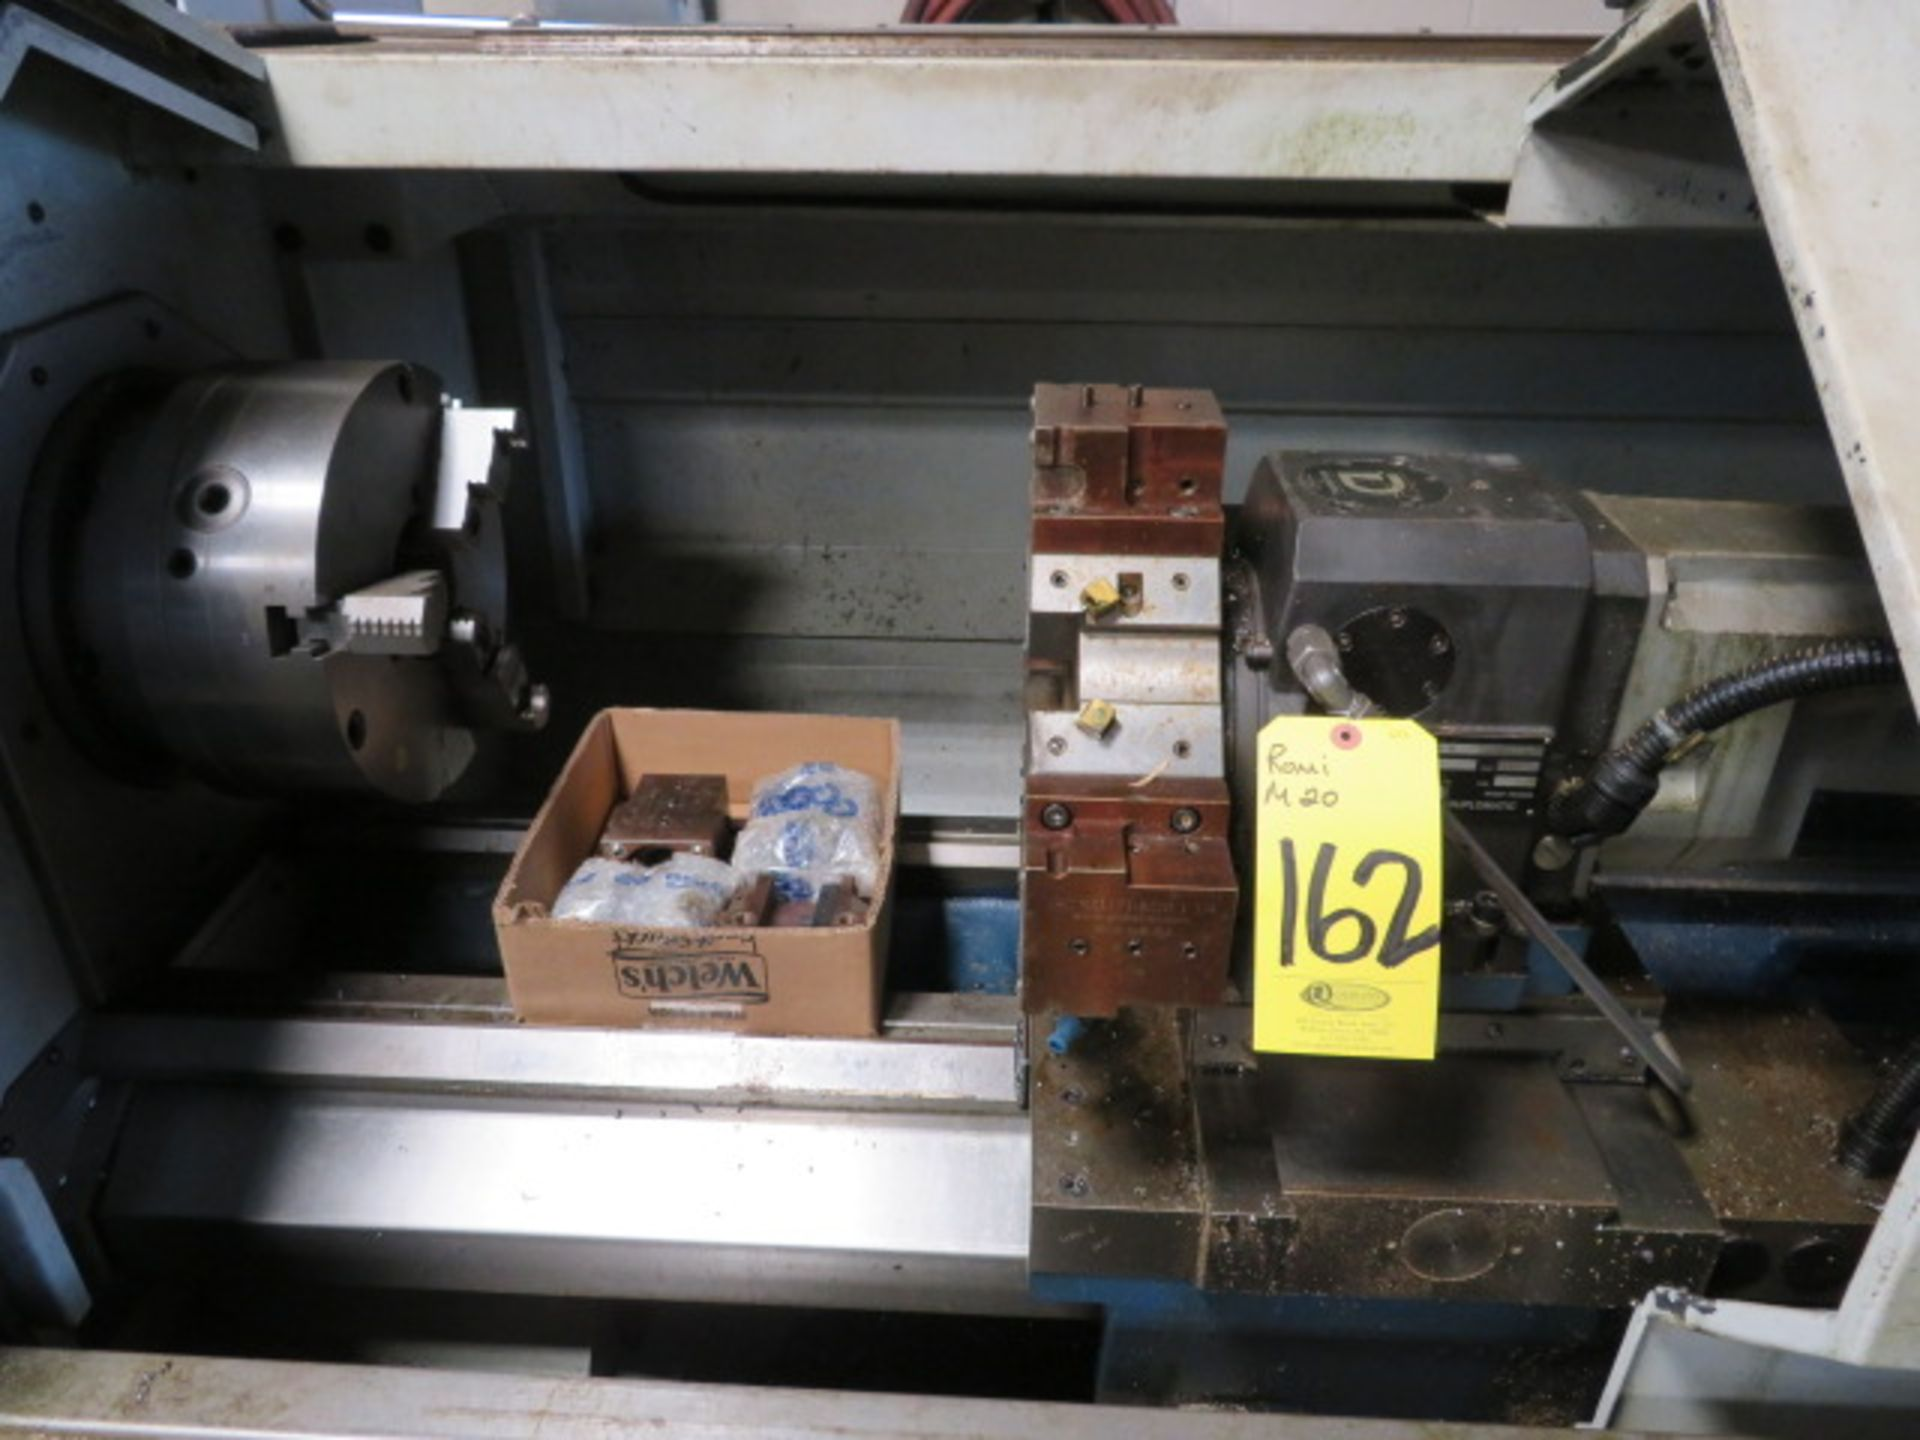 "Lot 162 - 2007 ROMI M-20 CNC LATHE, S/N 002-092875-404, FANUC 20i-T Control, 3.15 Spdl. Dia., 20"" x 80"" W/"